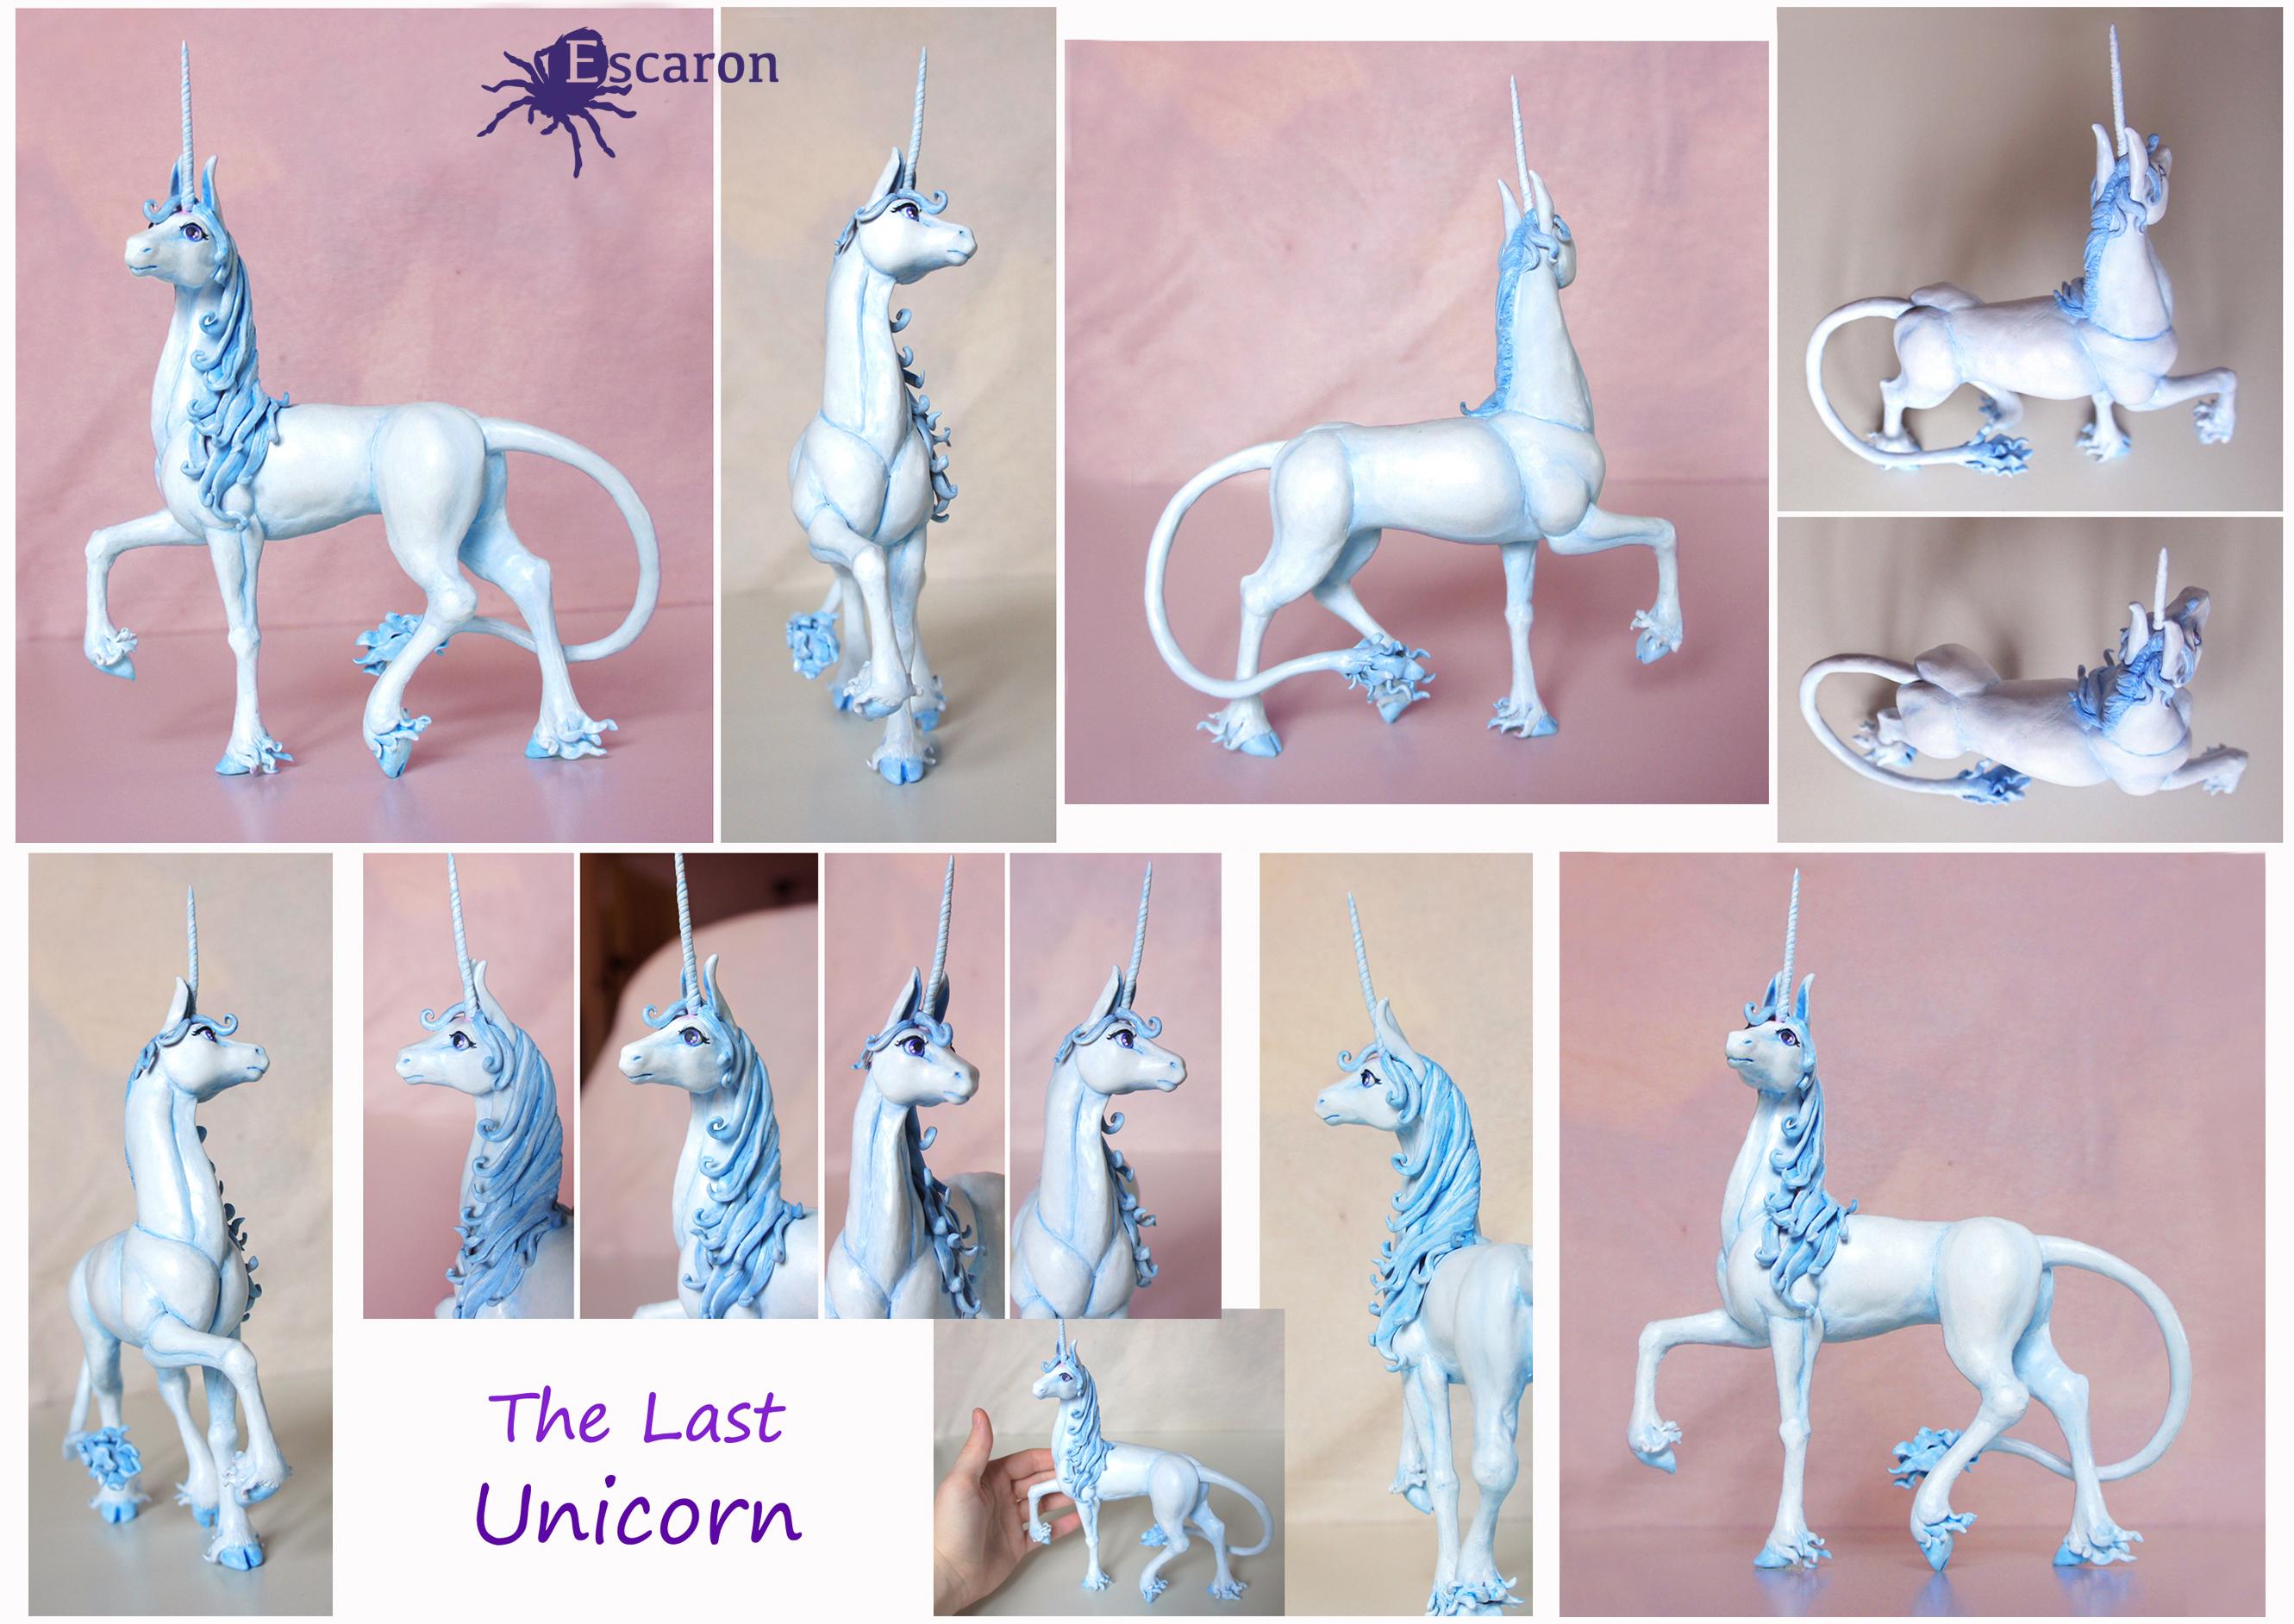 Last Unicorn - Sculpture by Escaron